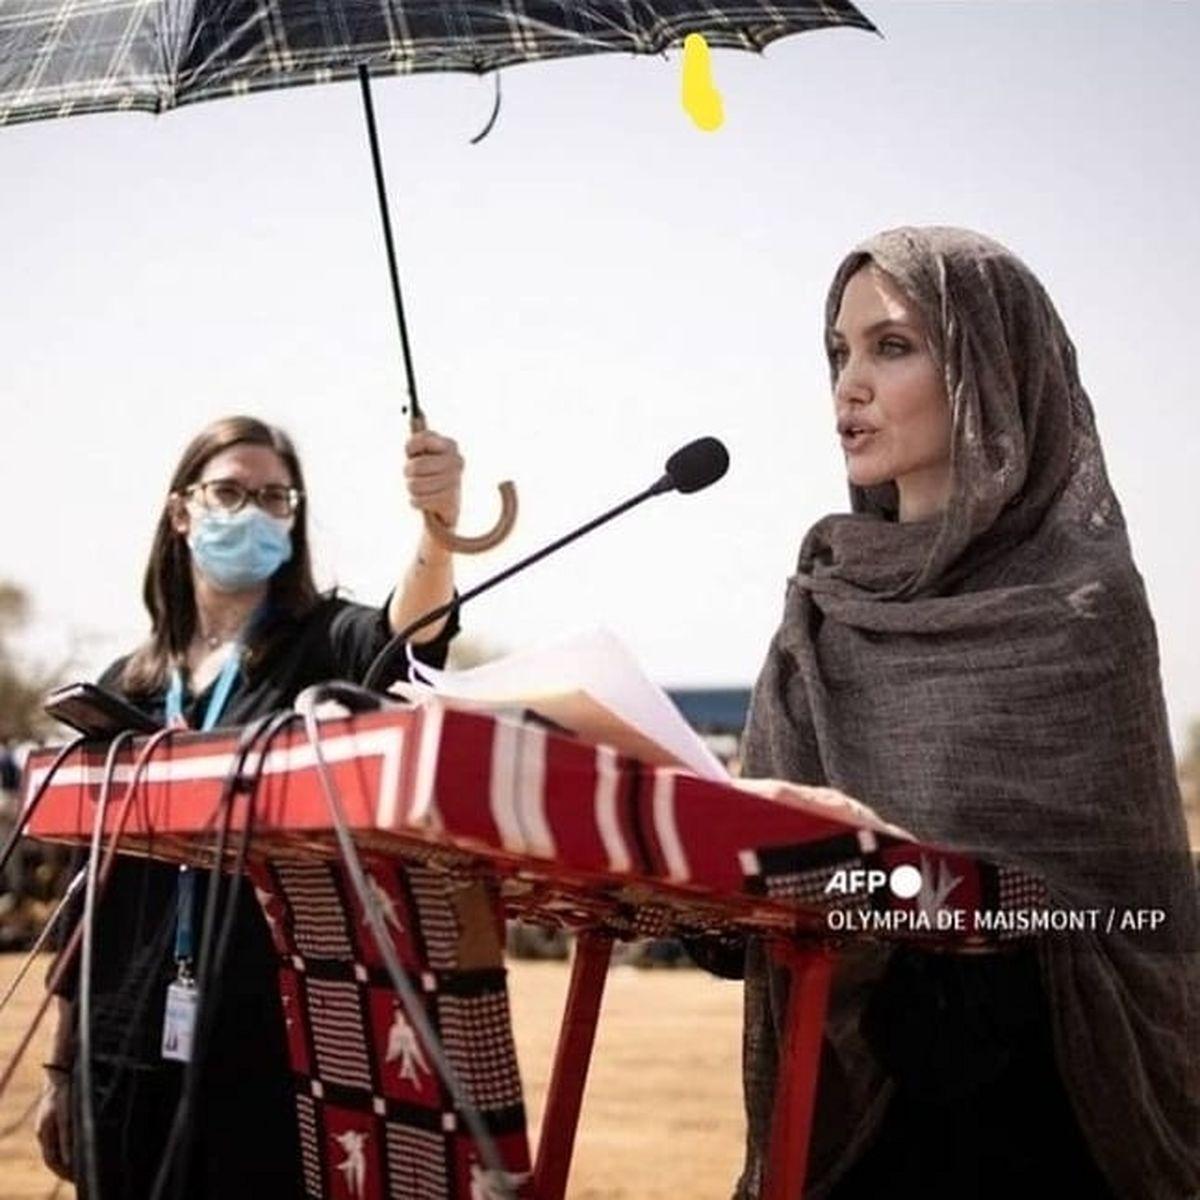 حجاب آنجلینا جولی سوژه داغ رسانه ها شد